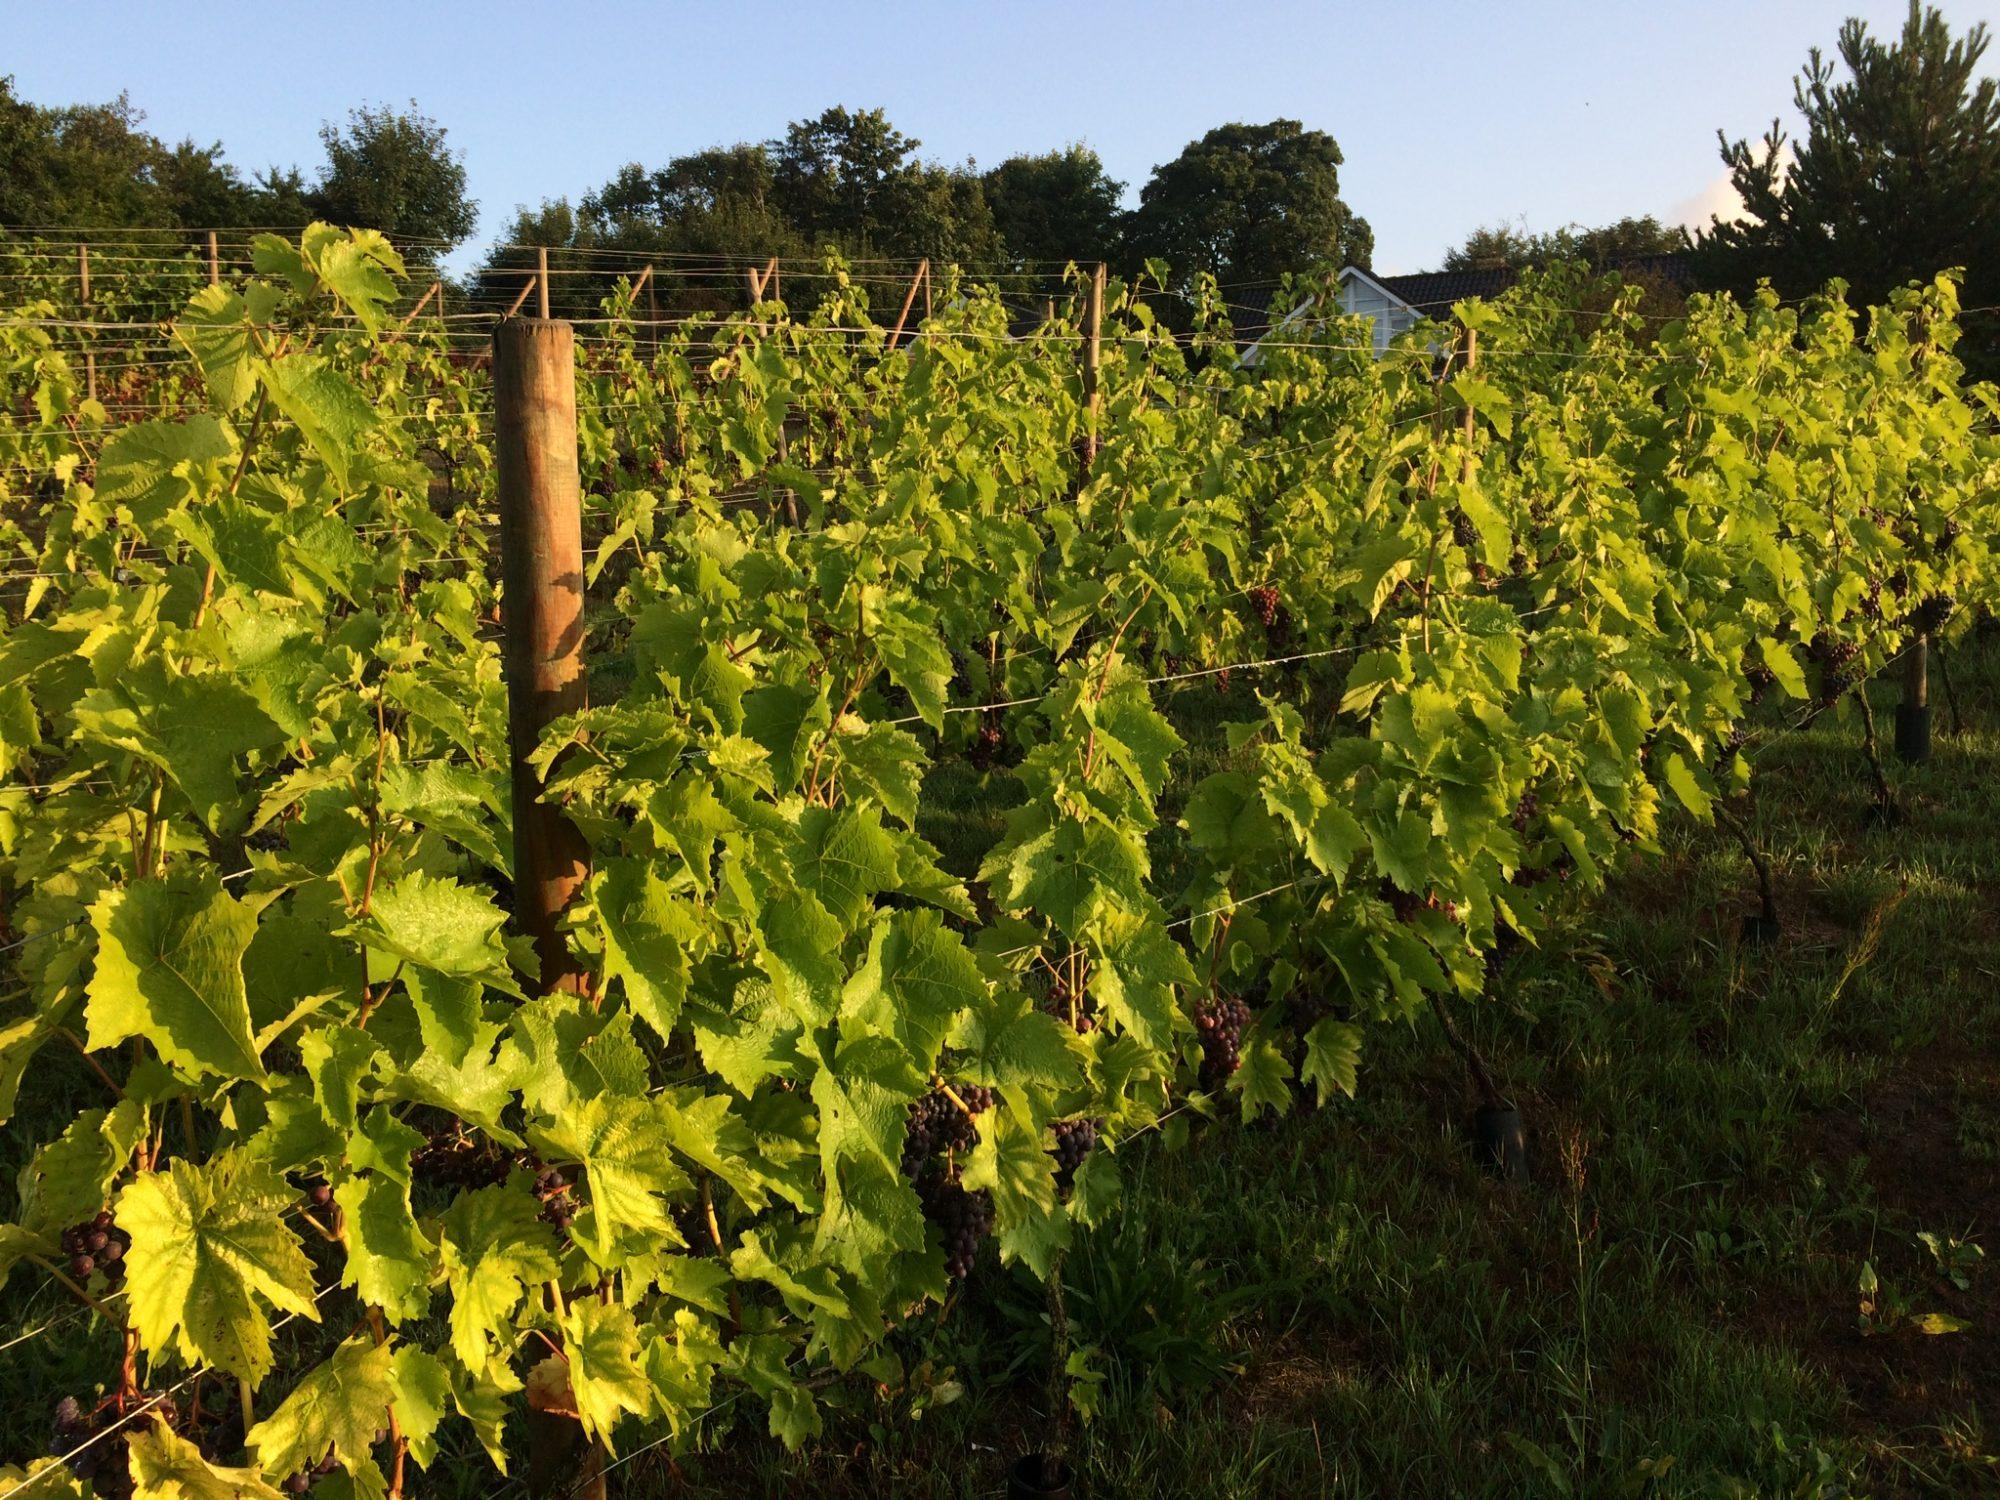 Hebbelstrup vingård